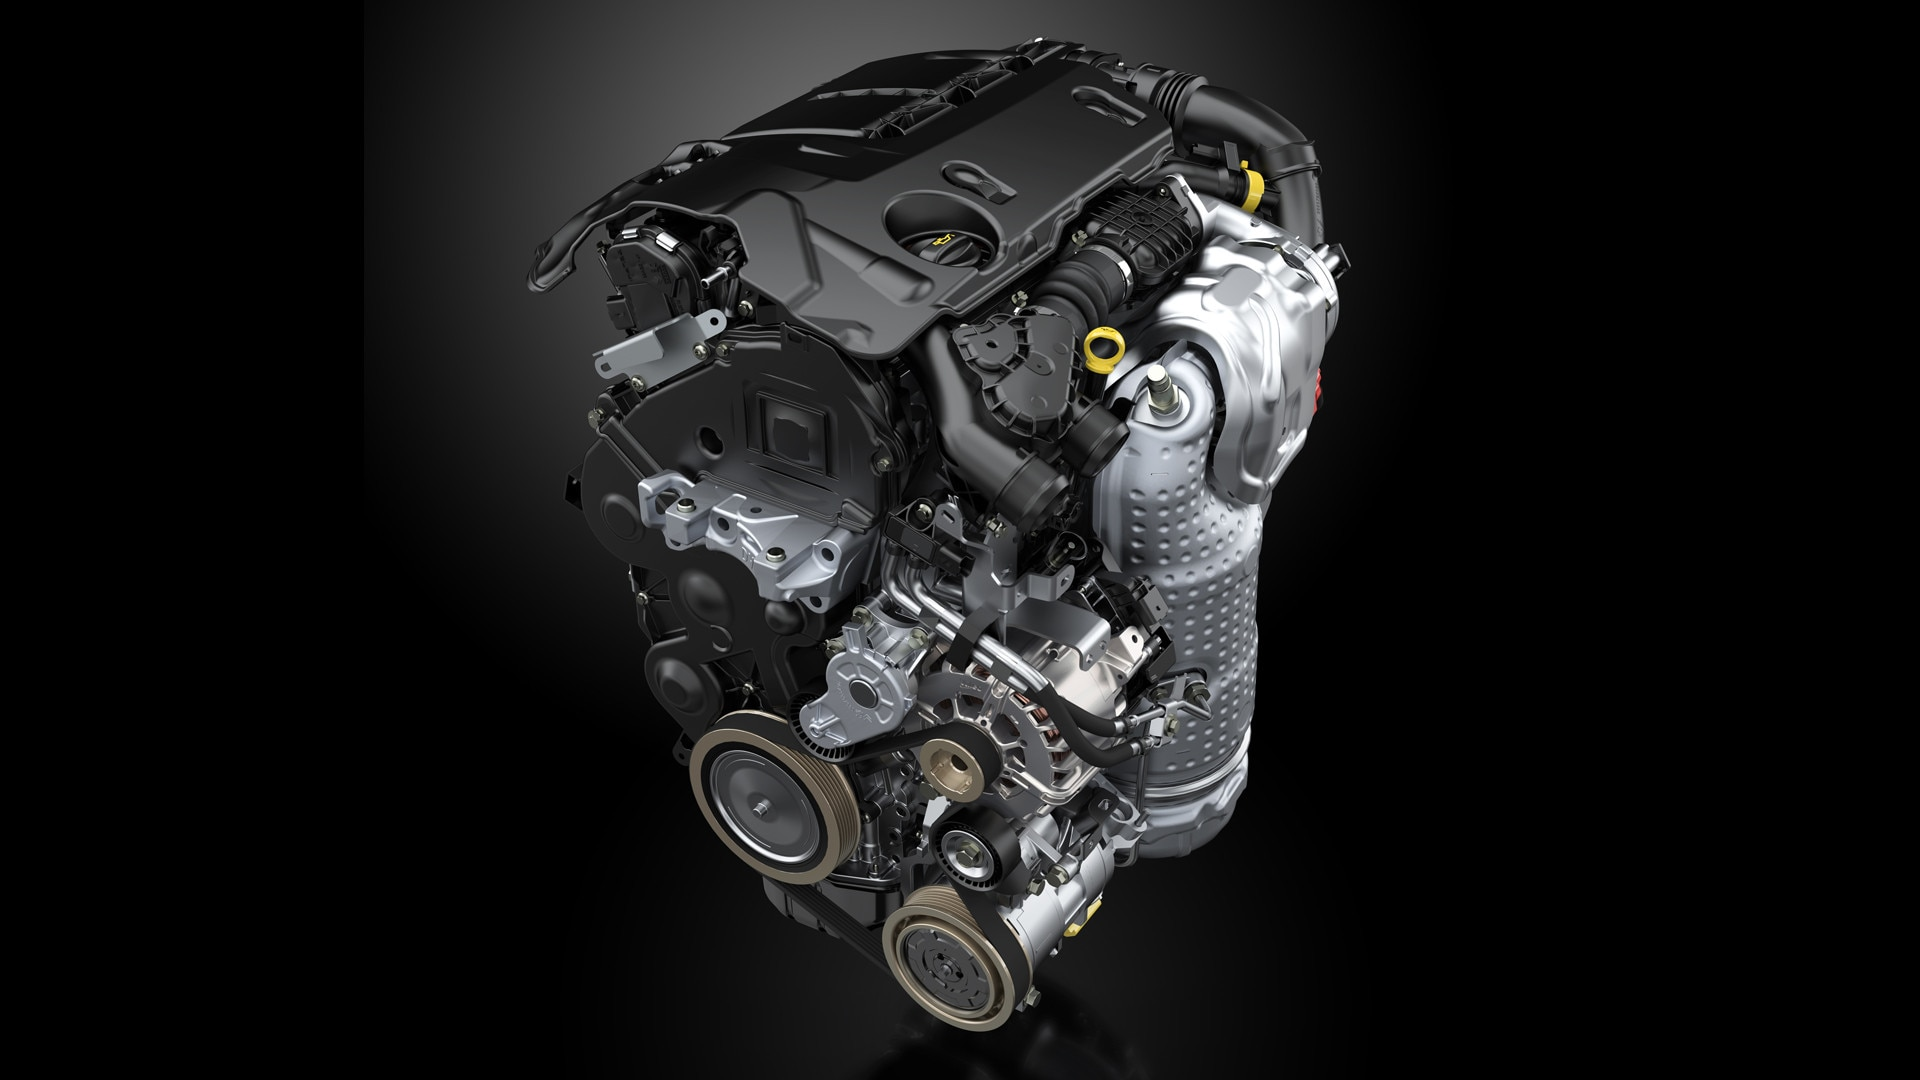 /image/85/1/peugeot_2008_moteurdiesel_1920x1080.223851.jpg